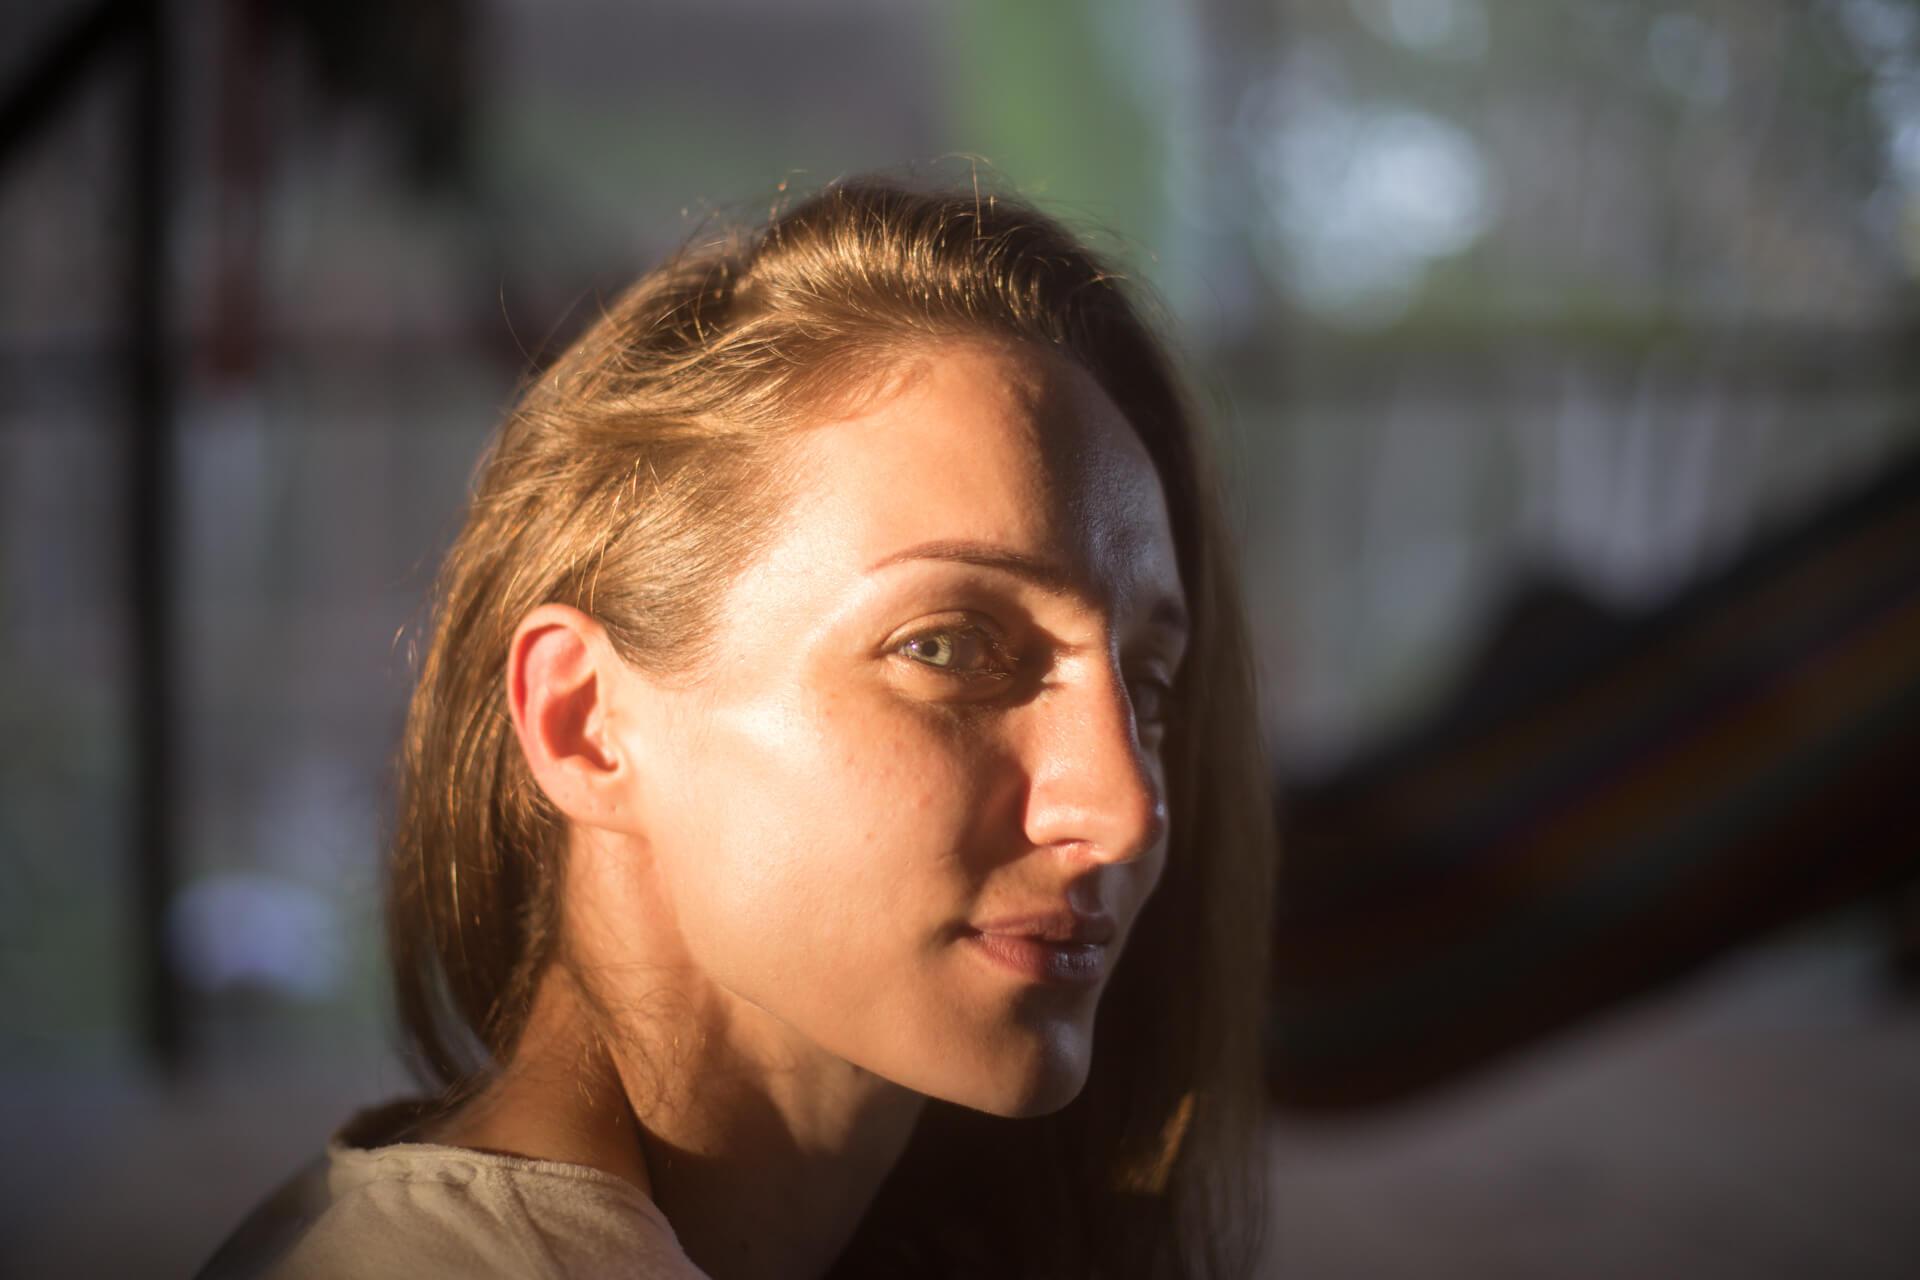 elle participant of ayahuasca retreat and master plan dieta in psychonauta foundation